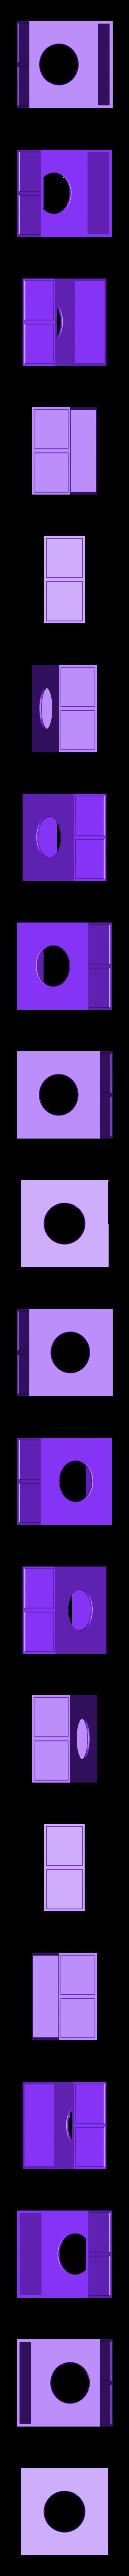 Bottom.stl Download free STL file Tardis inspired coaster box • 3D print object, Jakwit